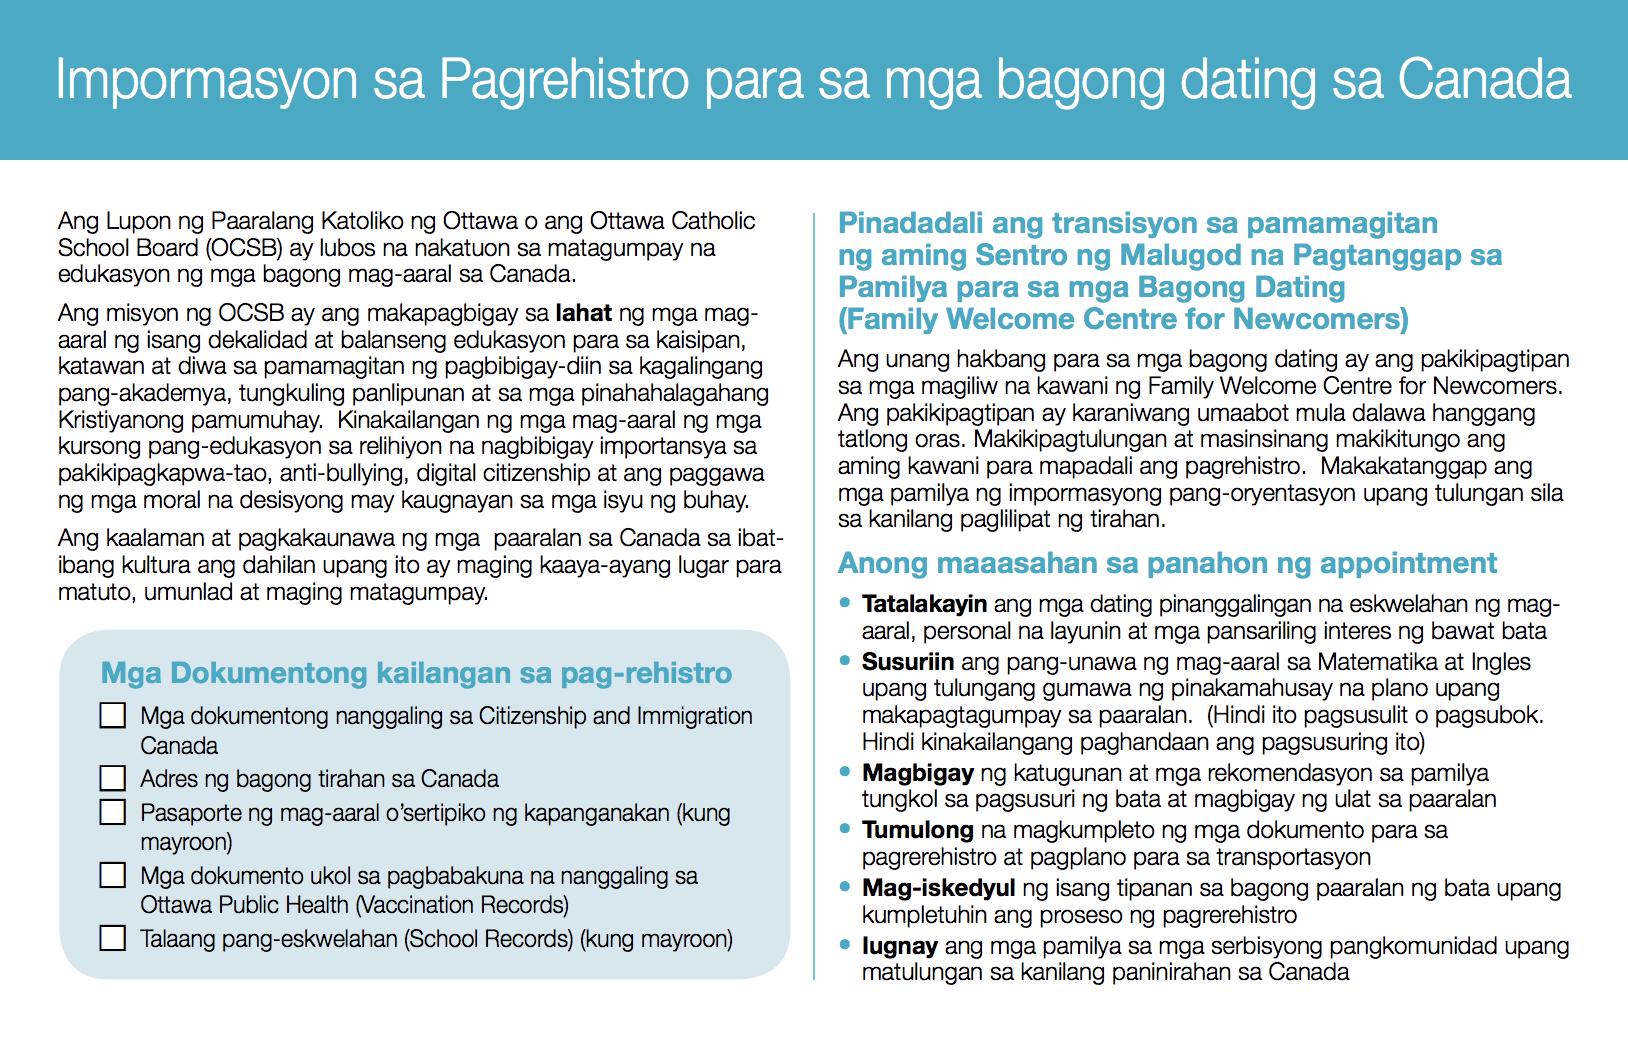 Tagalog - OCSB